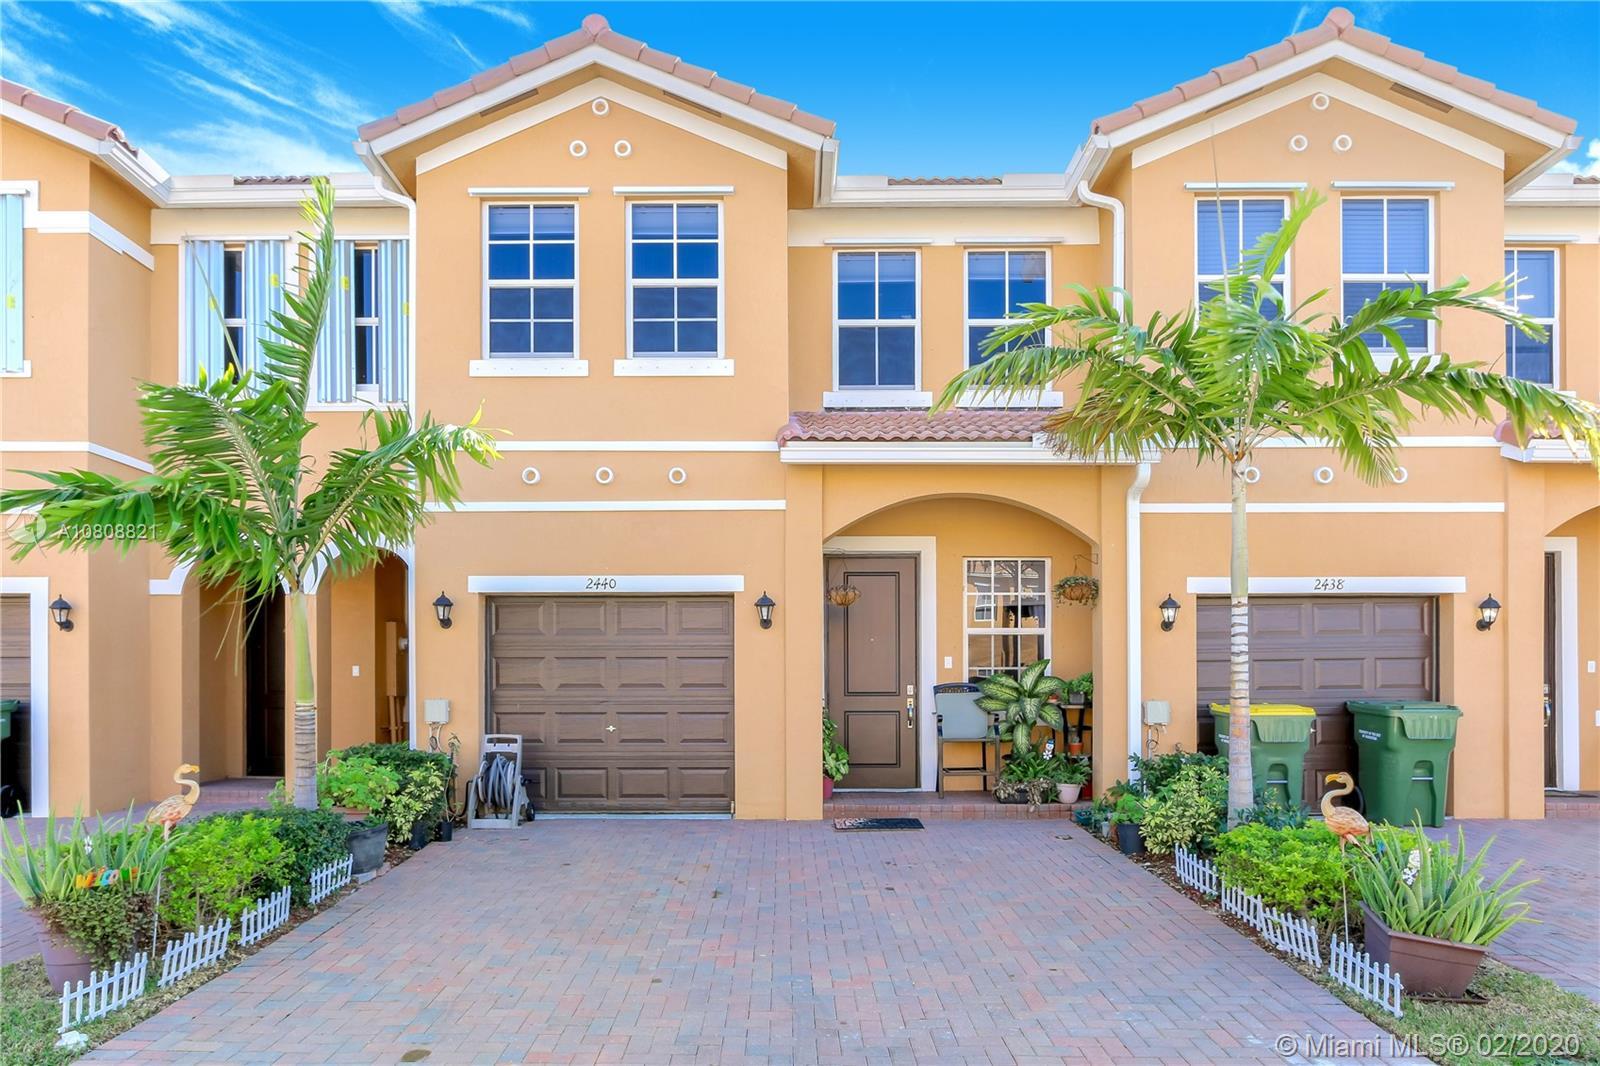 2440 SE 15th St #2440, Homestead, FL 33035 - Homestead, FL real estate listing